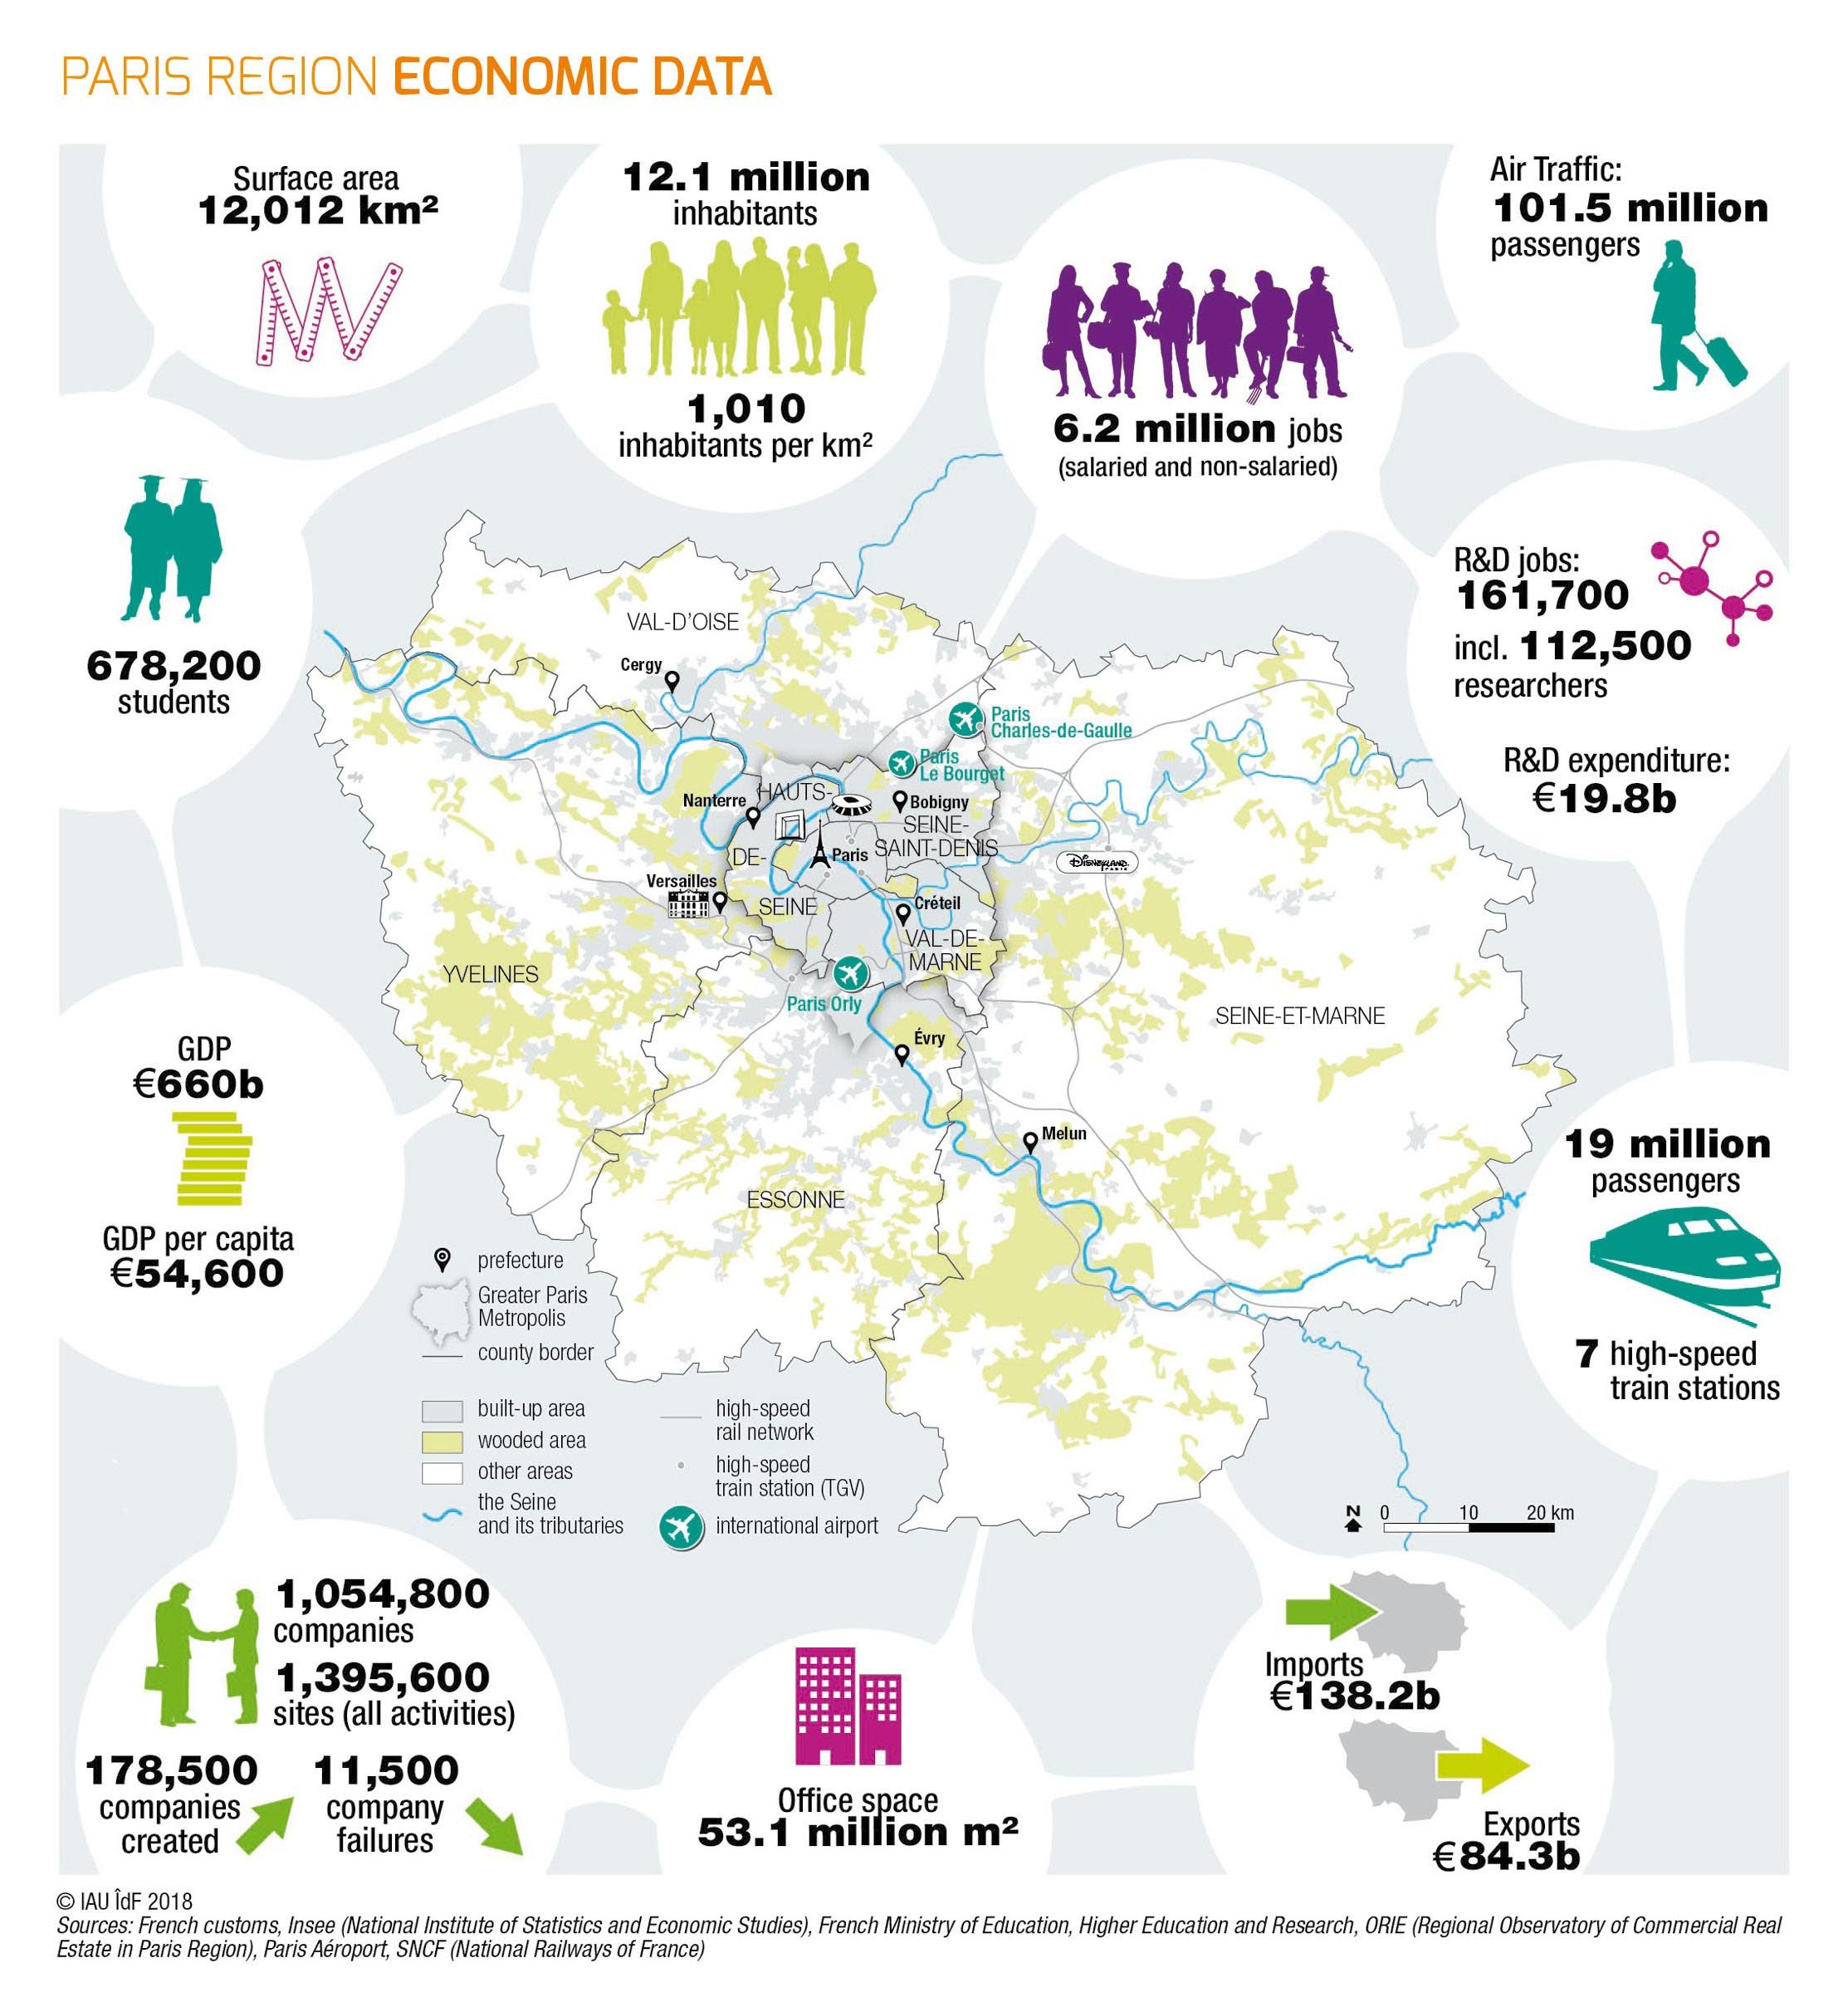 Map Of France With Key.Paris Region Key Figures 2018 Euractiv Com